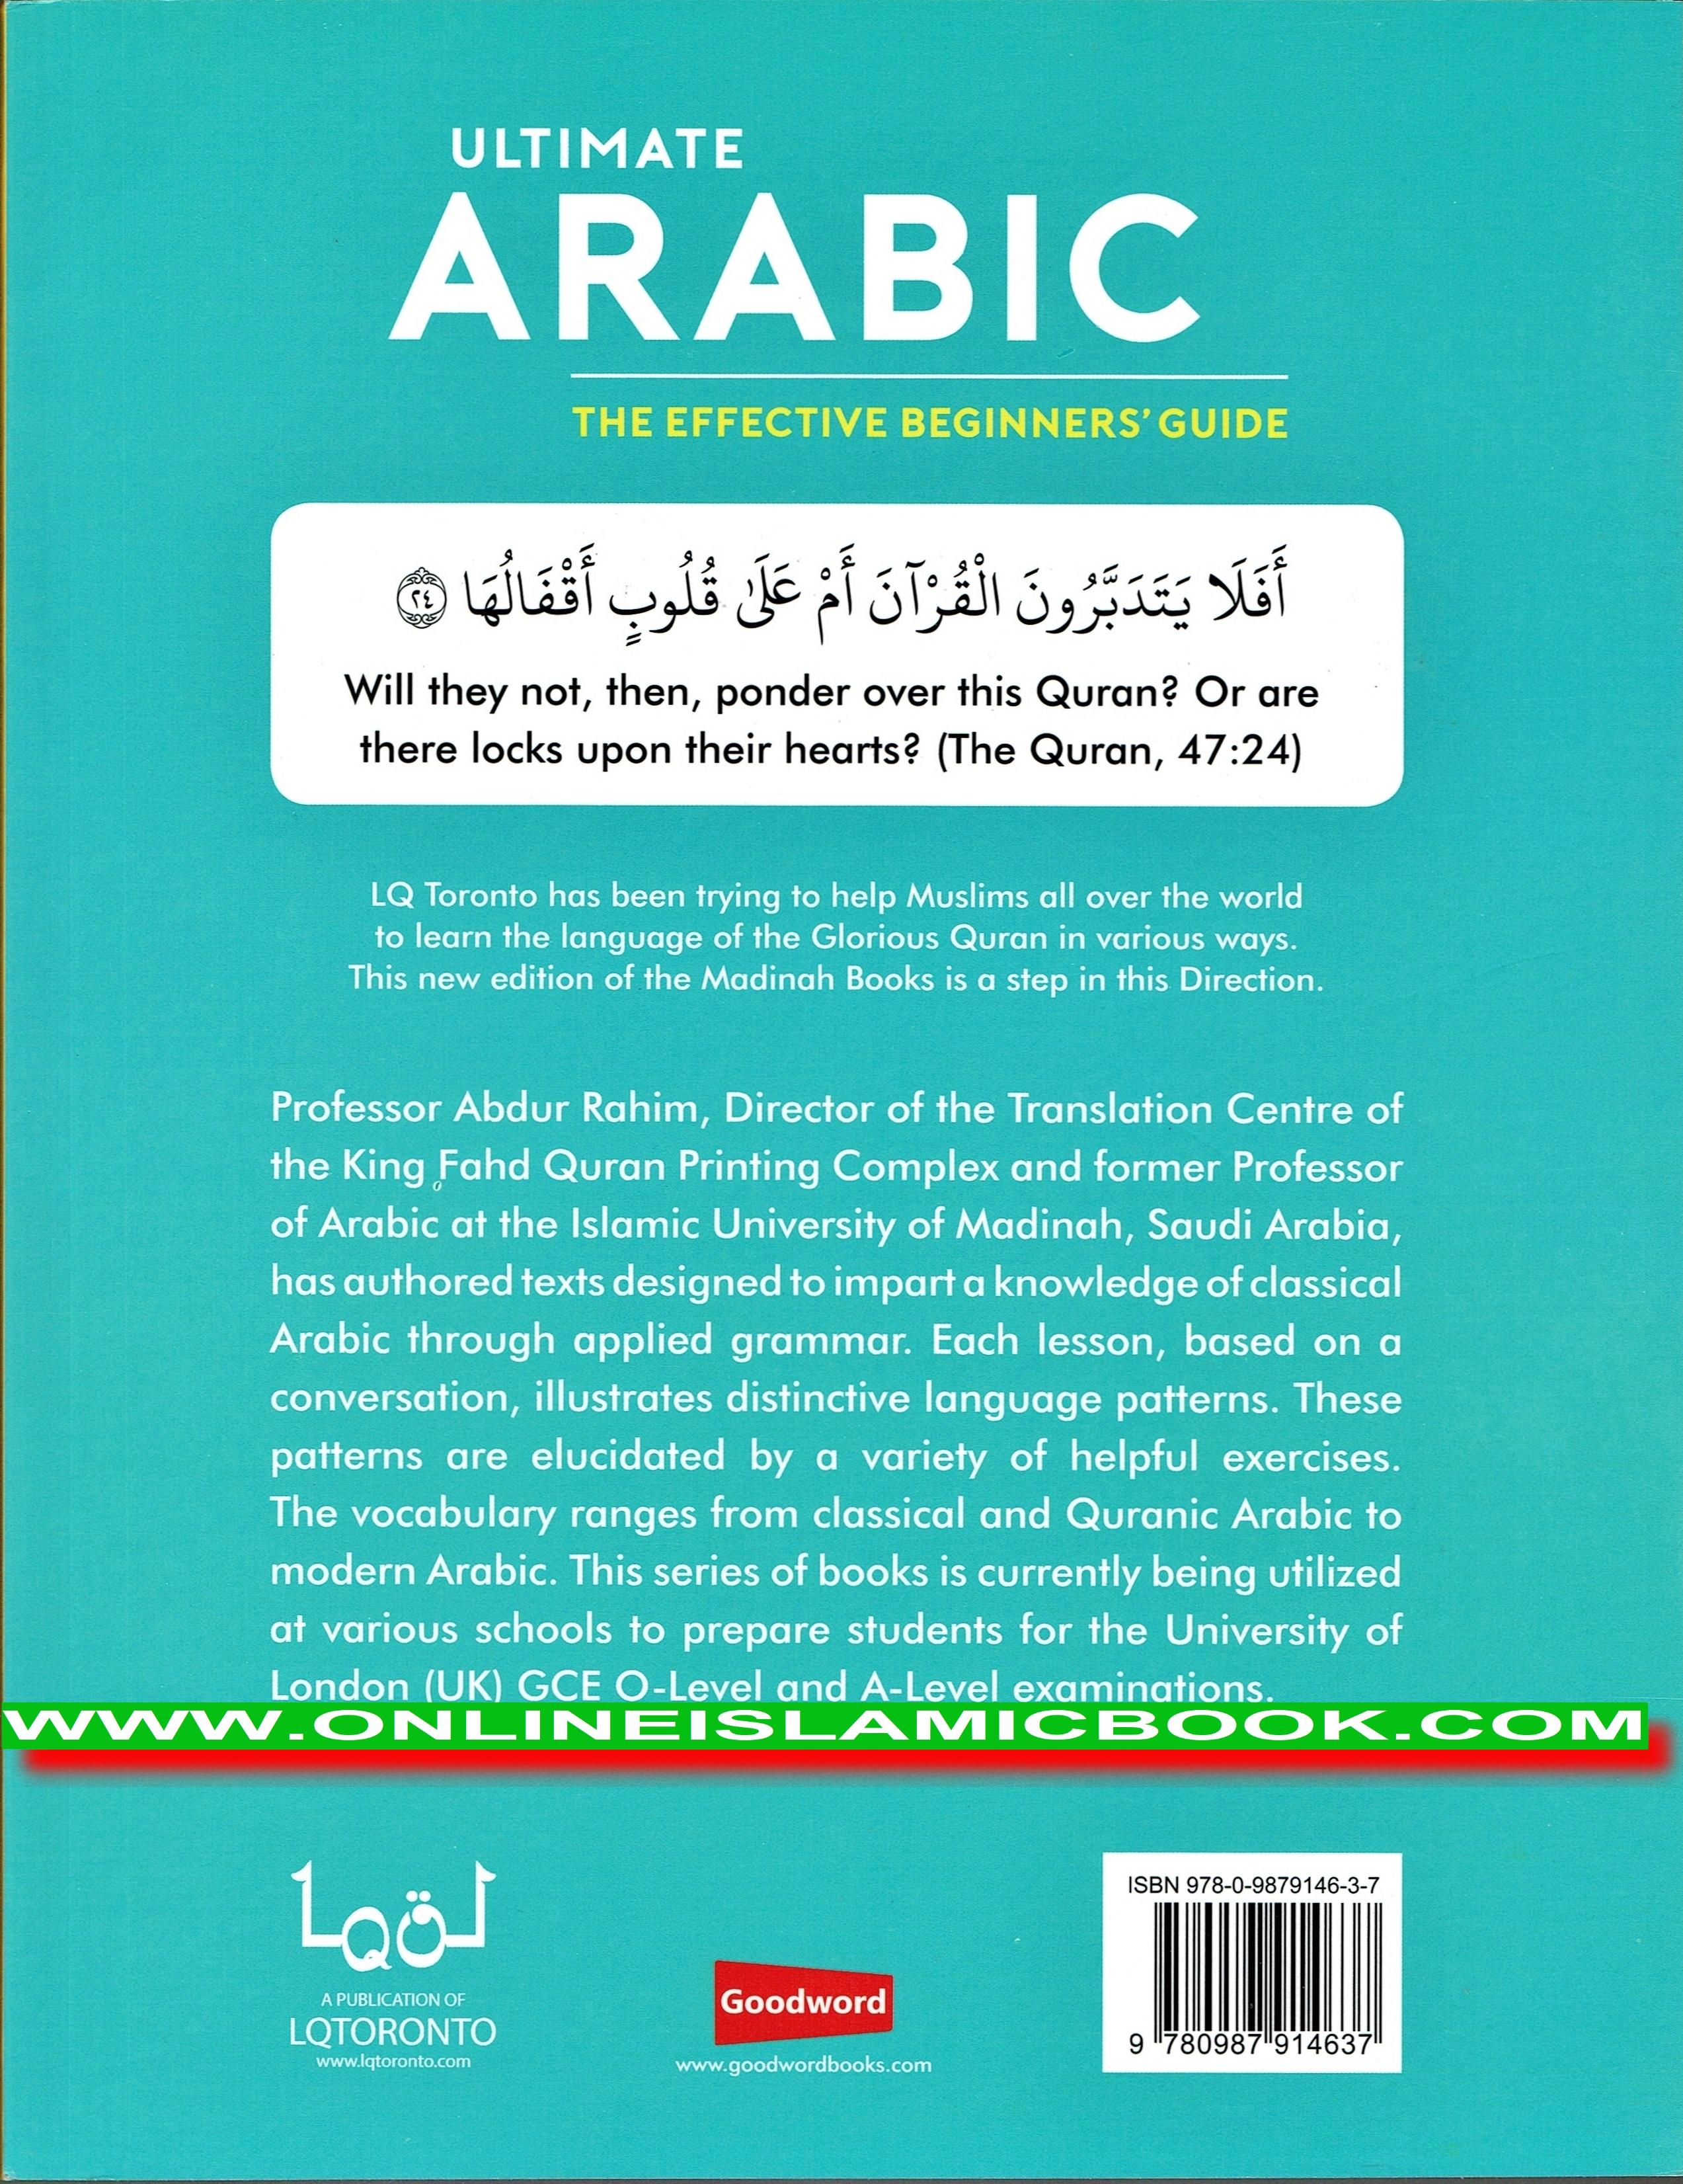 ultimate-arabic-course-book-2-2-.jpg